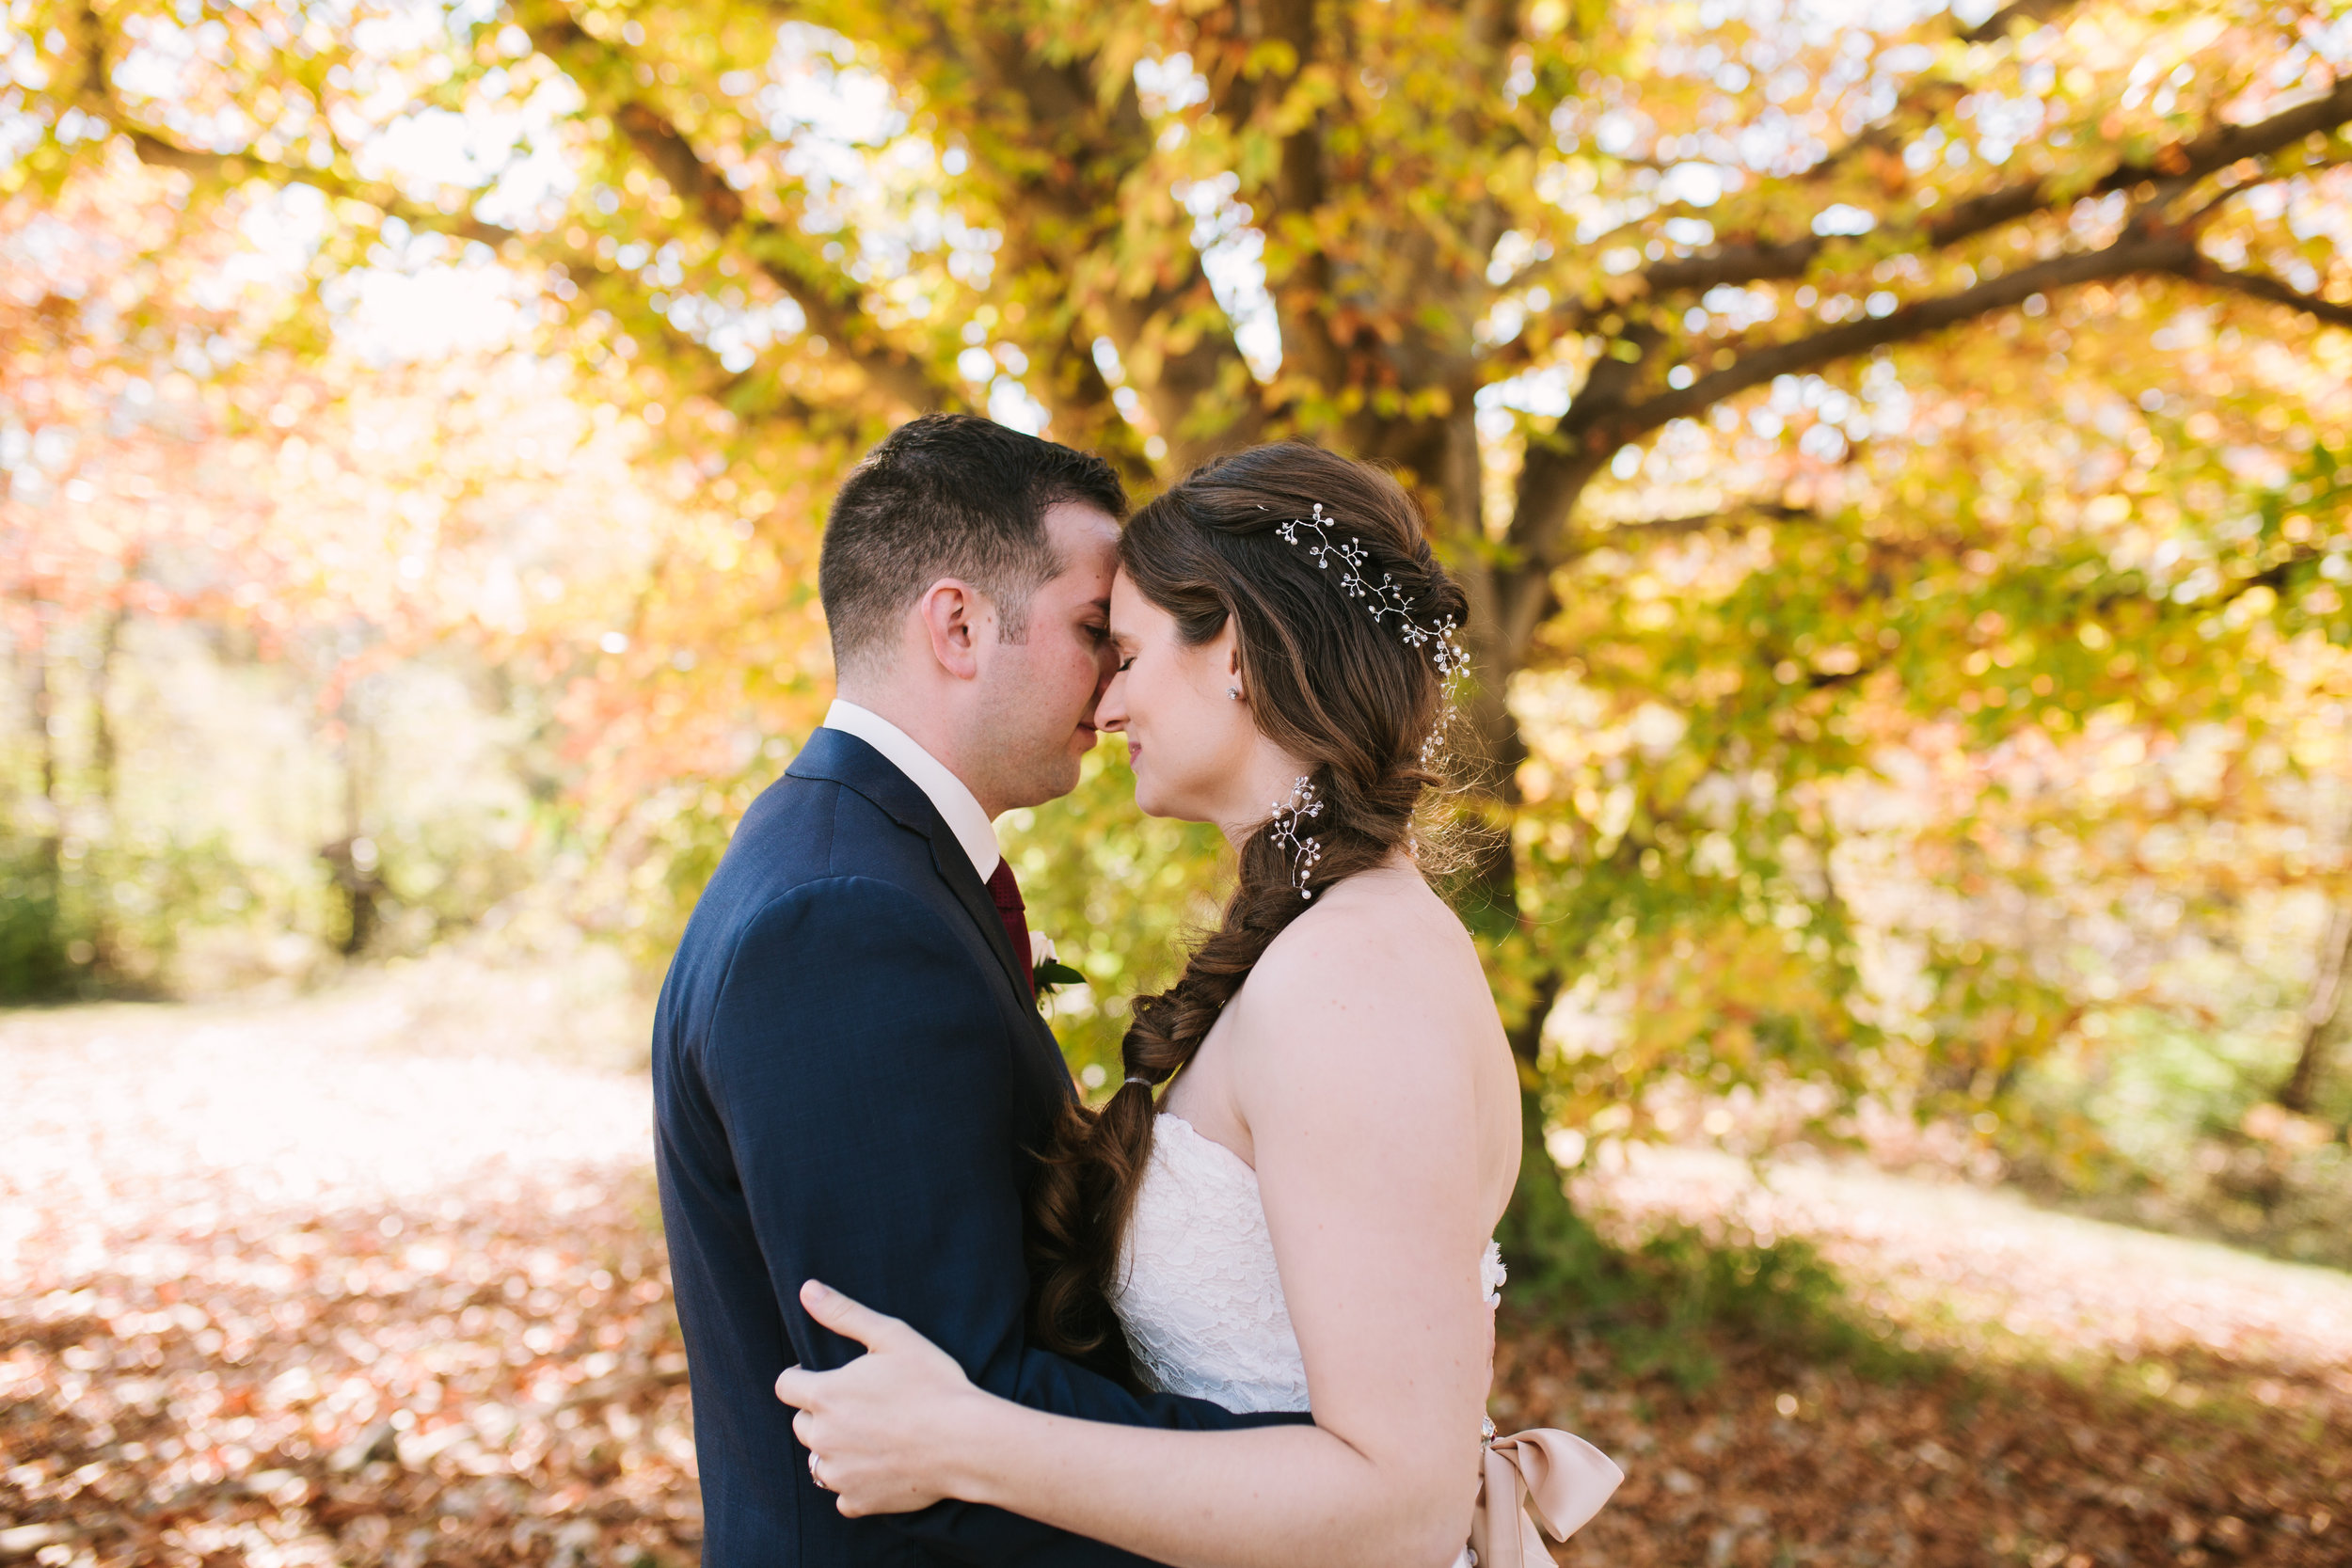 lifestyle wedding photographer louisville kentucky kendra lynne photography -110.JPG